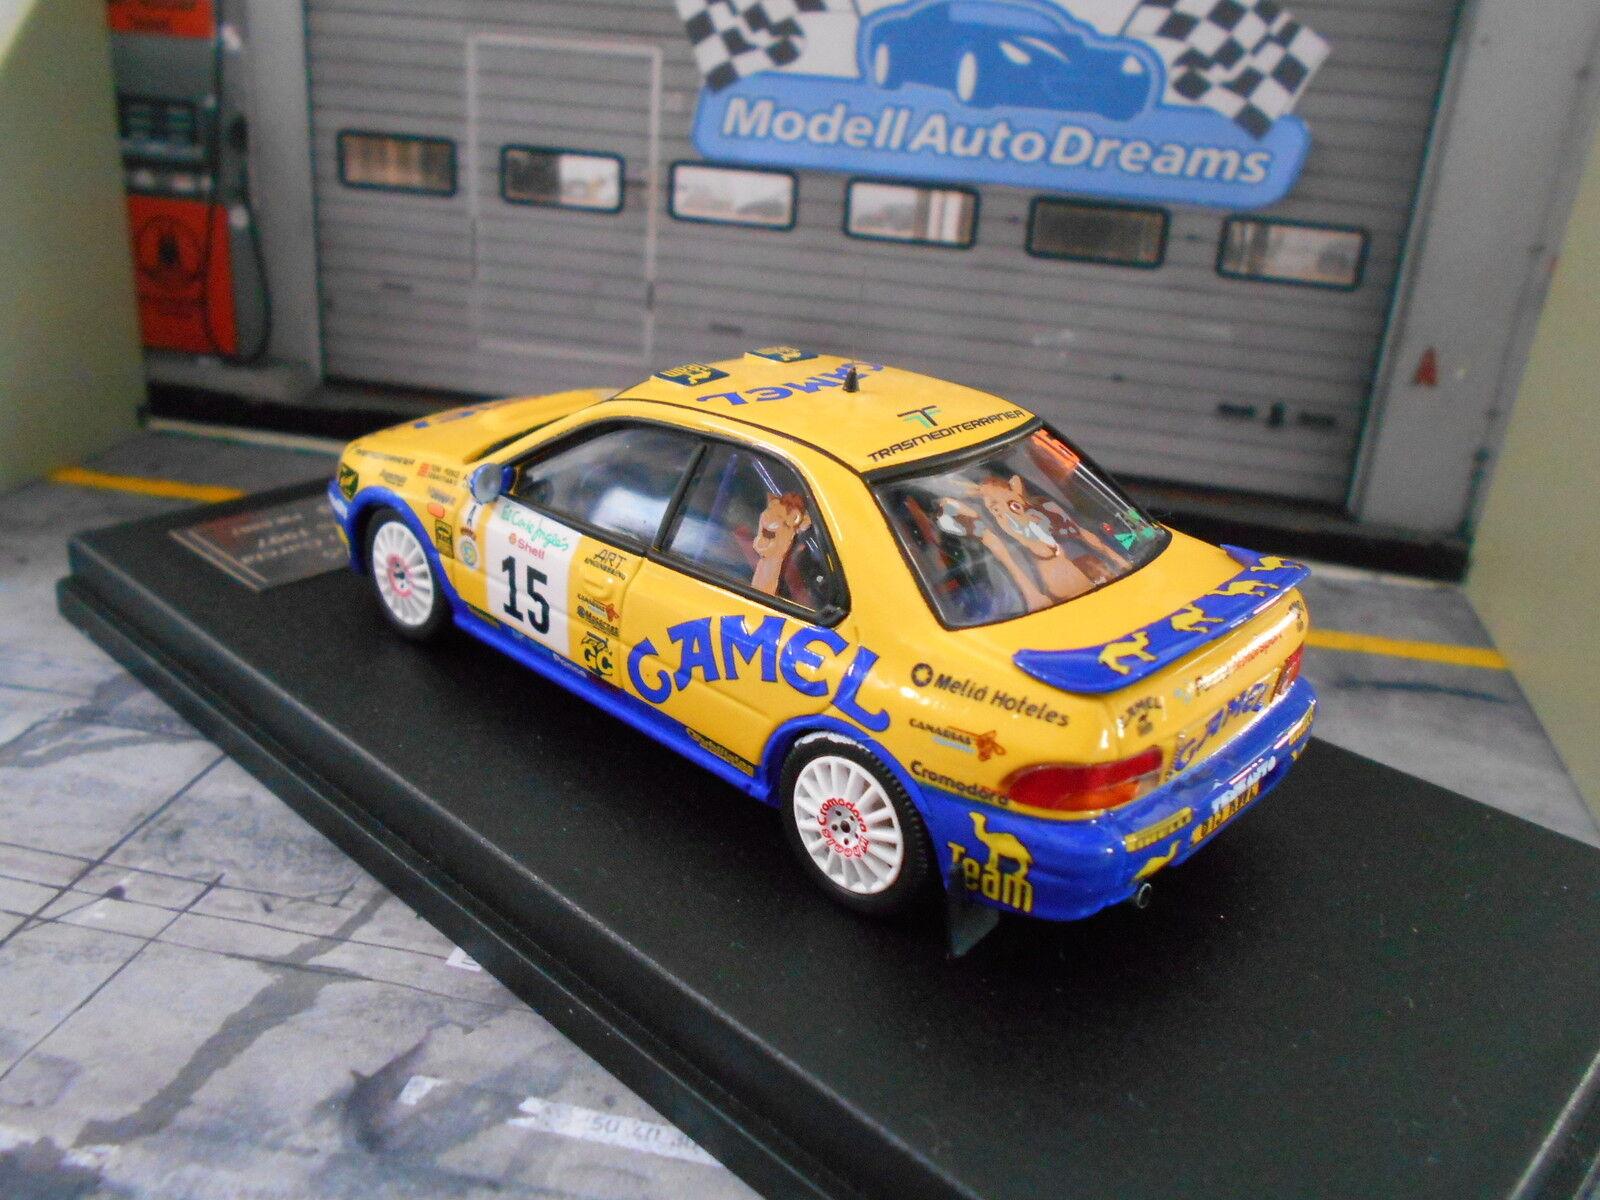 SUBARU Impreza WRC Rallye Corte Ingles 1997 1997 1997  15 Ponce Camel Trofeu 1 250 1 43 30b681